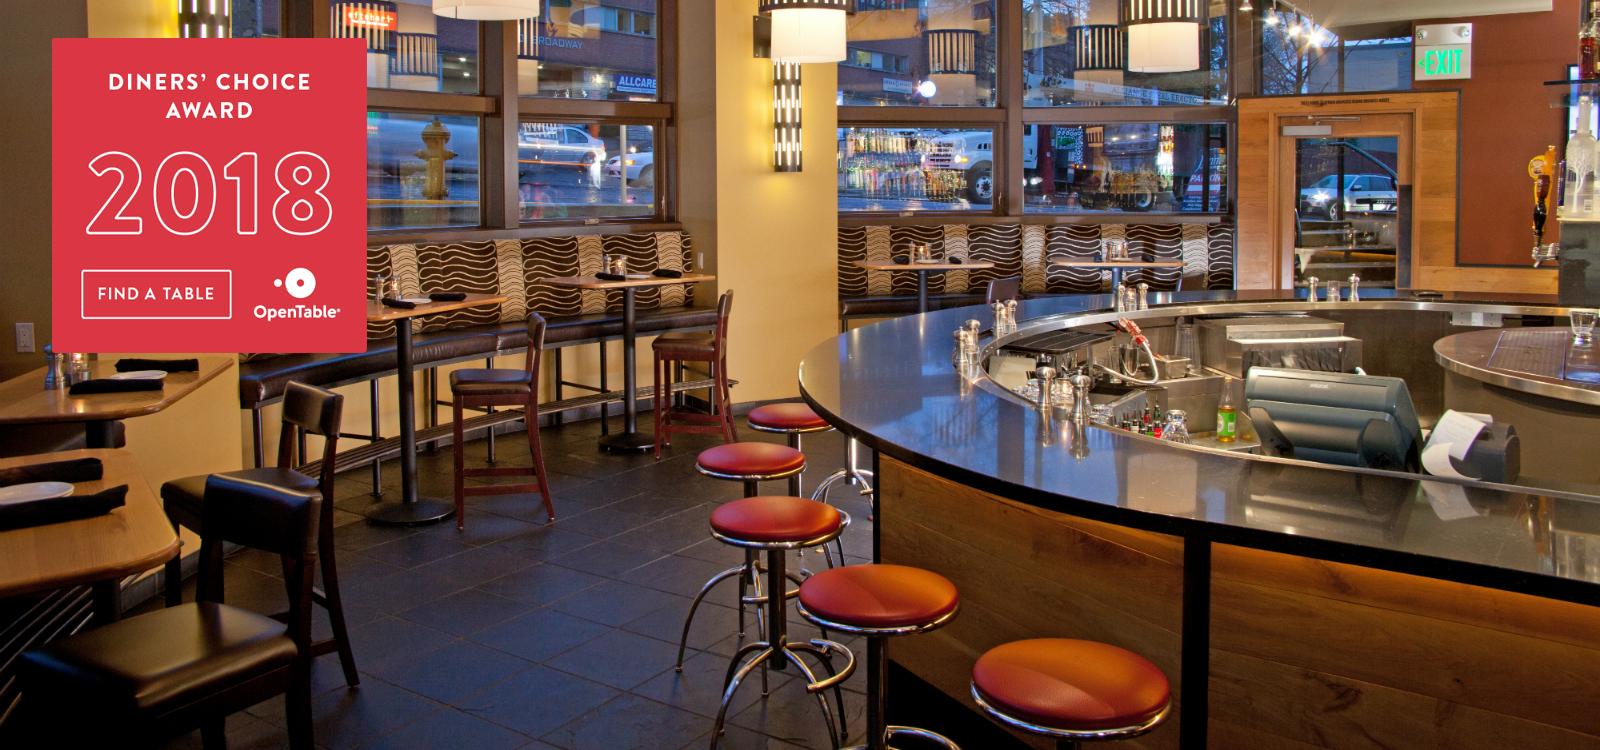 Jimmys On Broadway Silver Cloud Hotels And Inns Seattle Broadway - Open table seattle